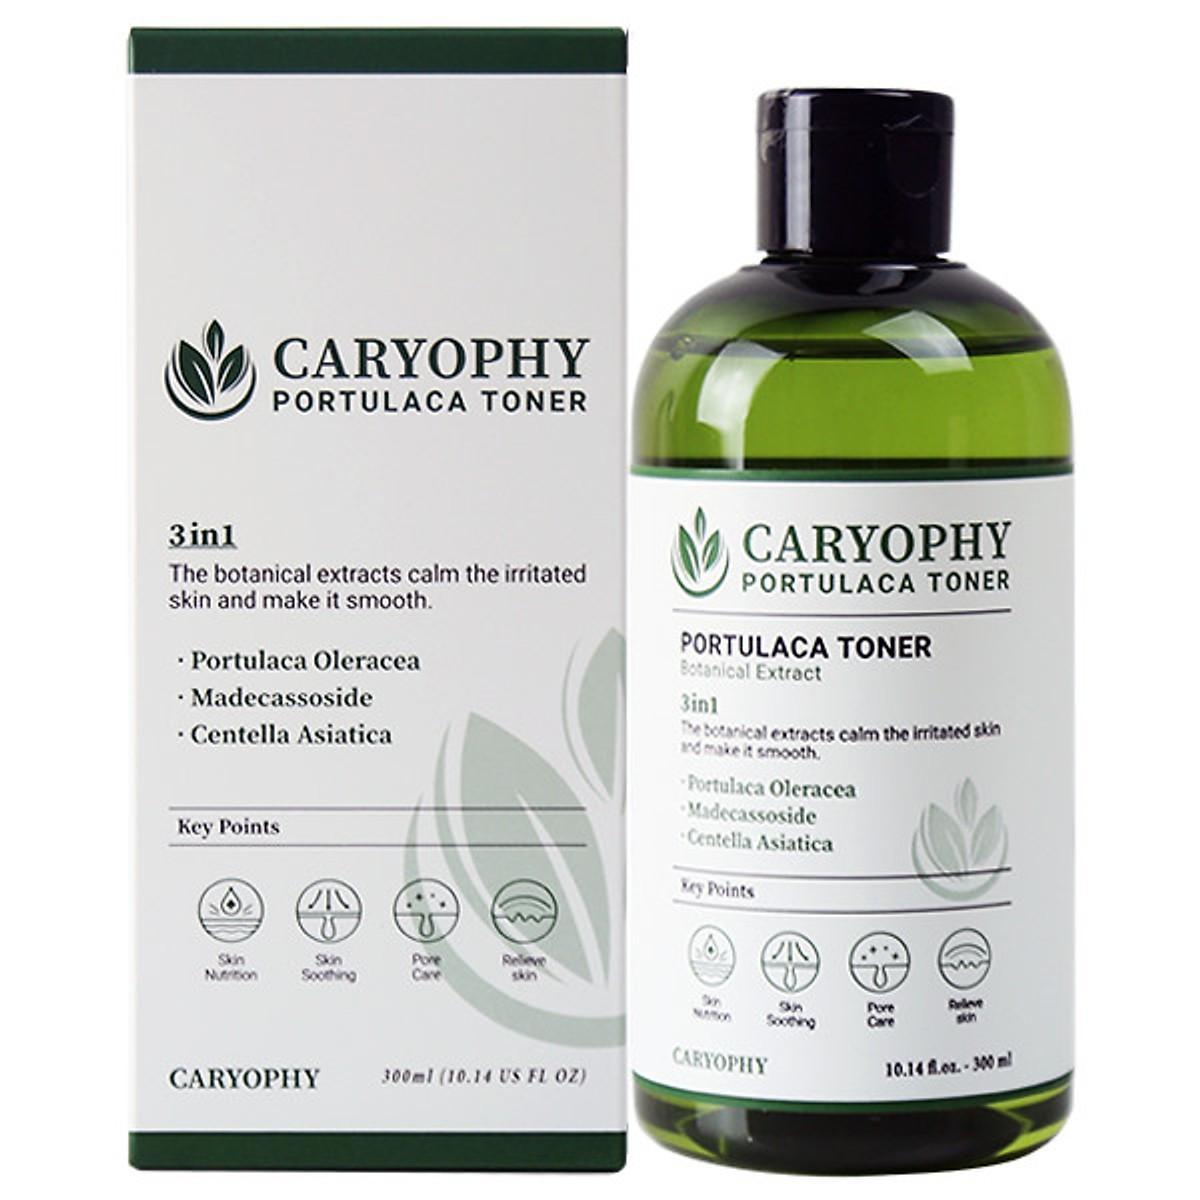 Review Nước hoa hồng dưỡng da giảm mụn Caryophy Portulaca Toner 300ml